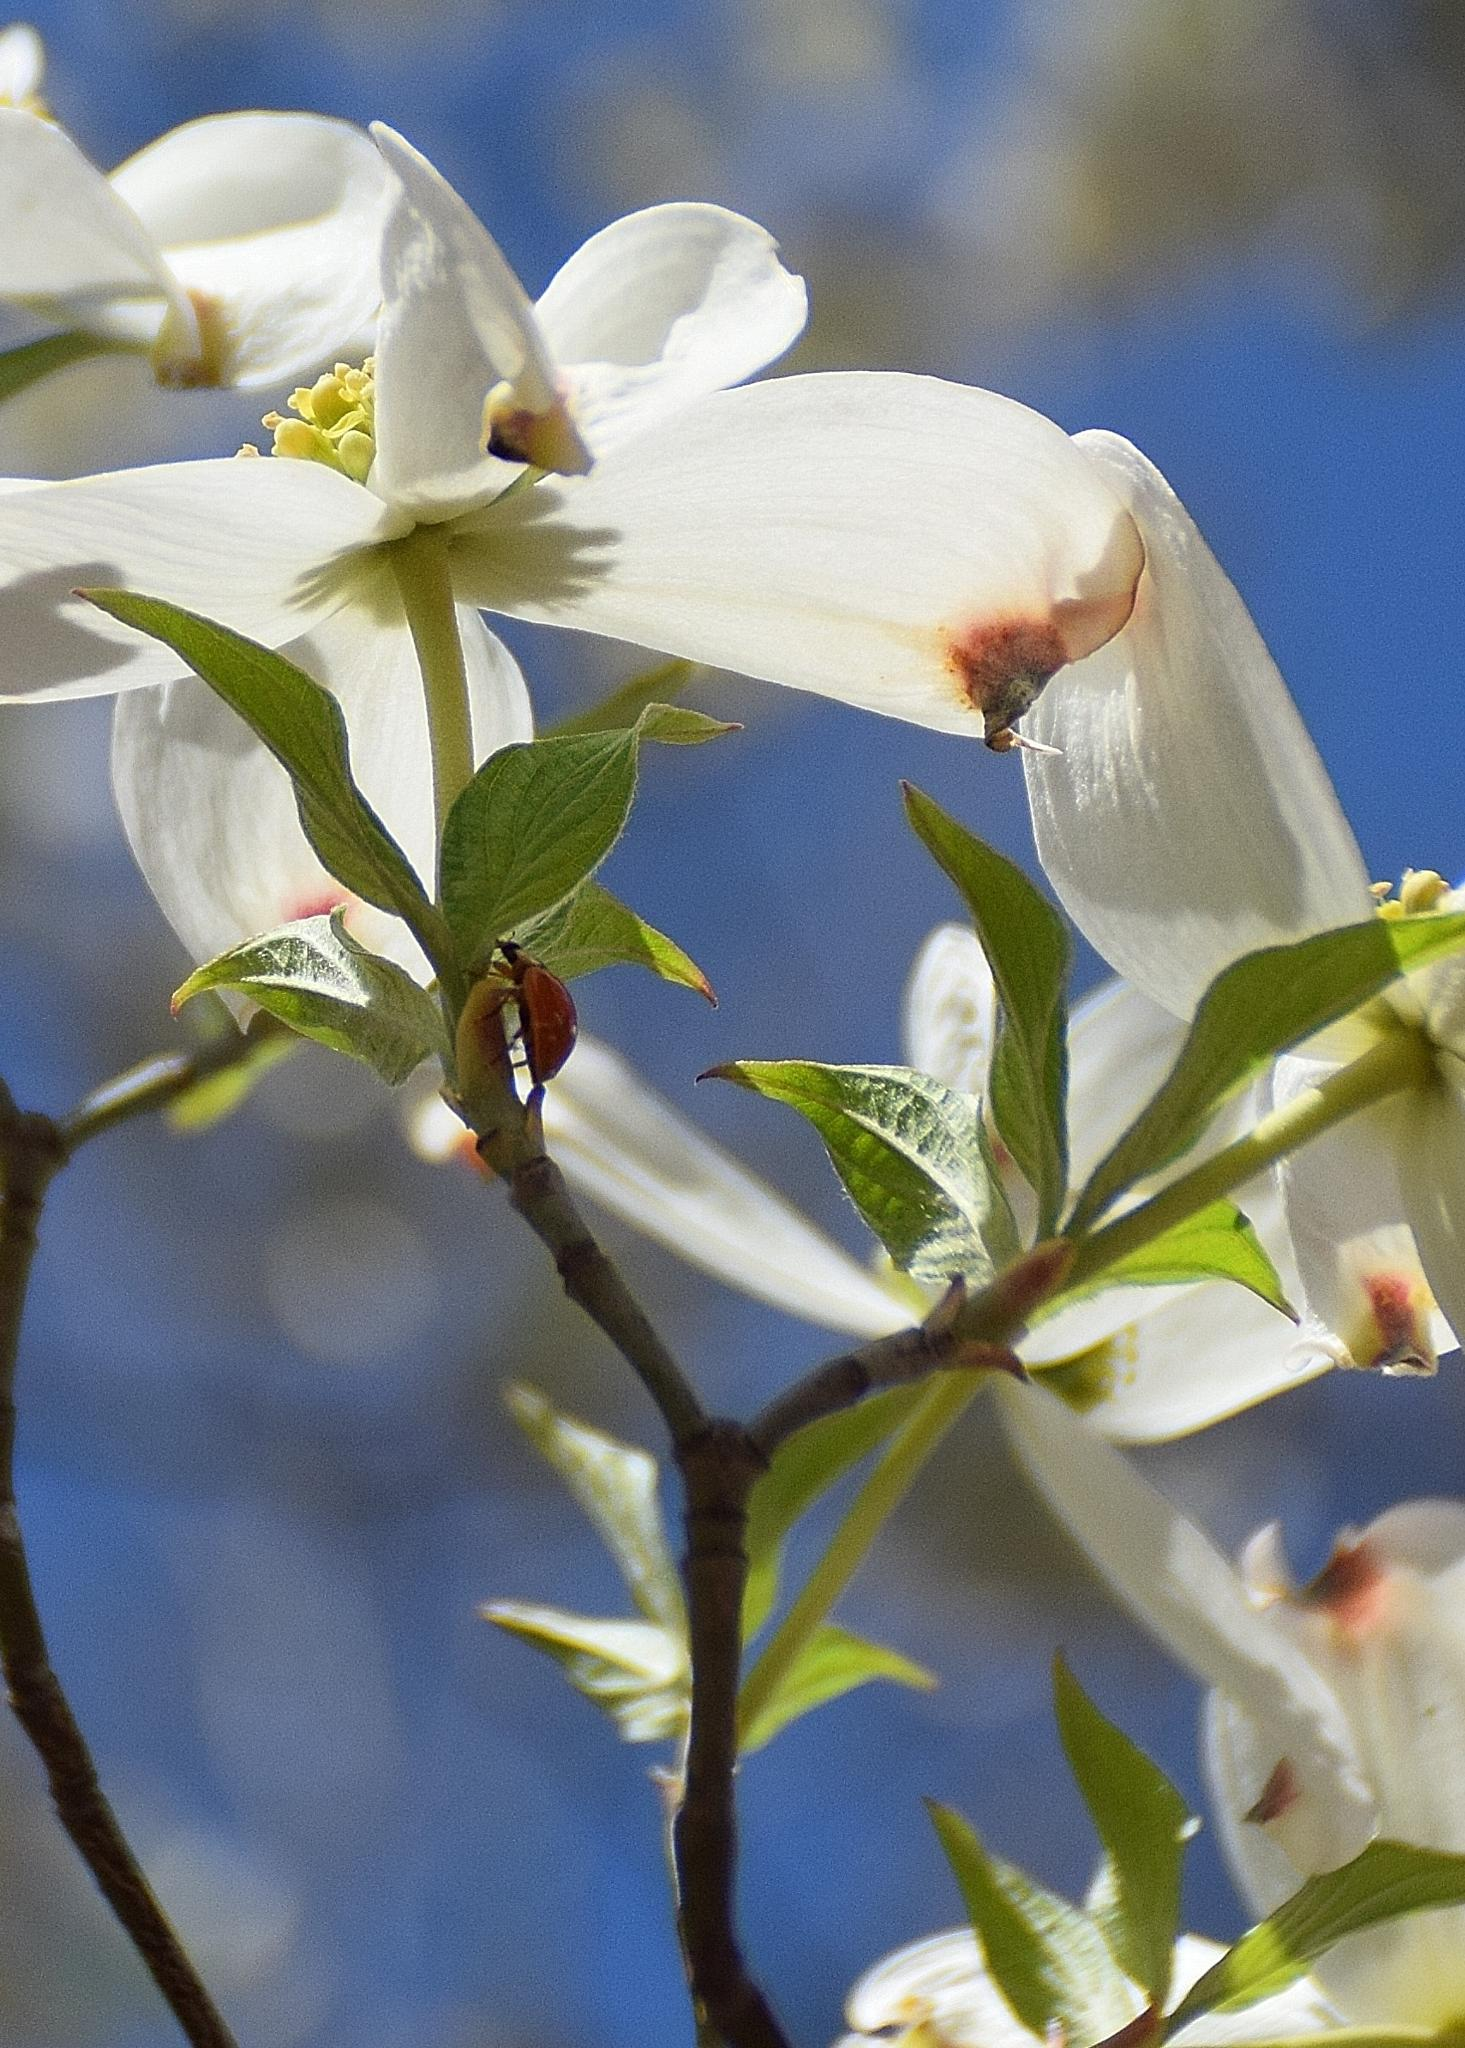 Flower 86~Lady Bug by Lawrence Scott Hess